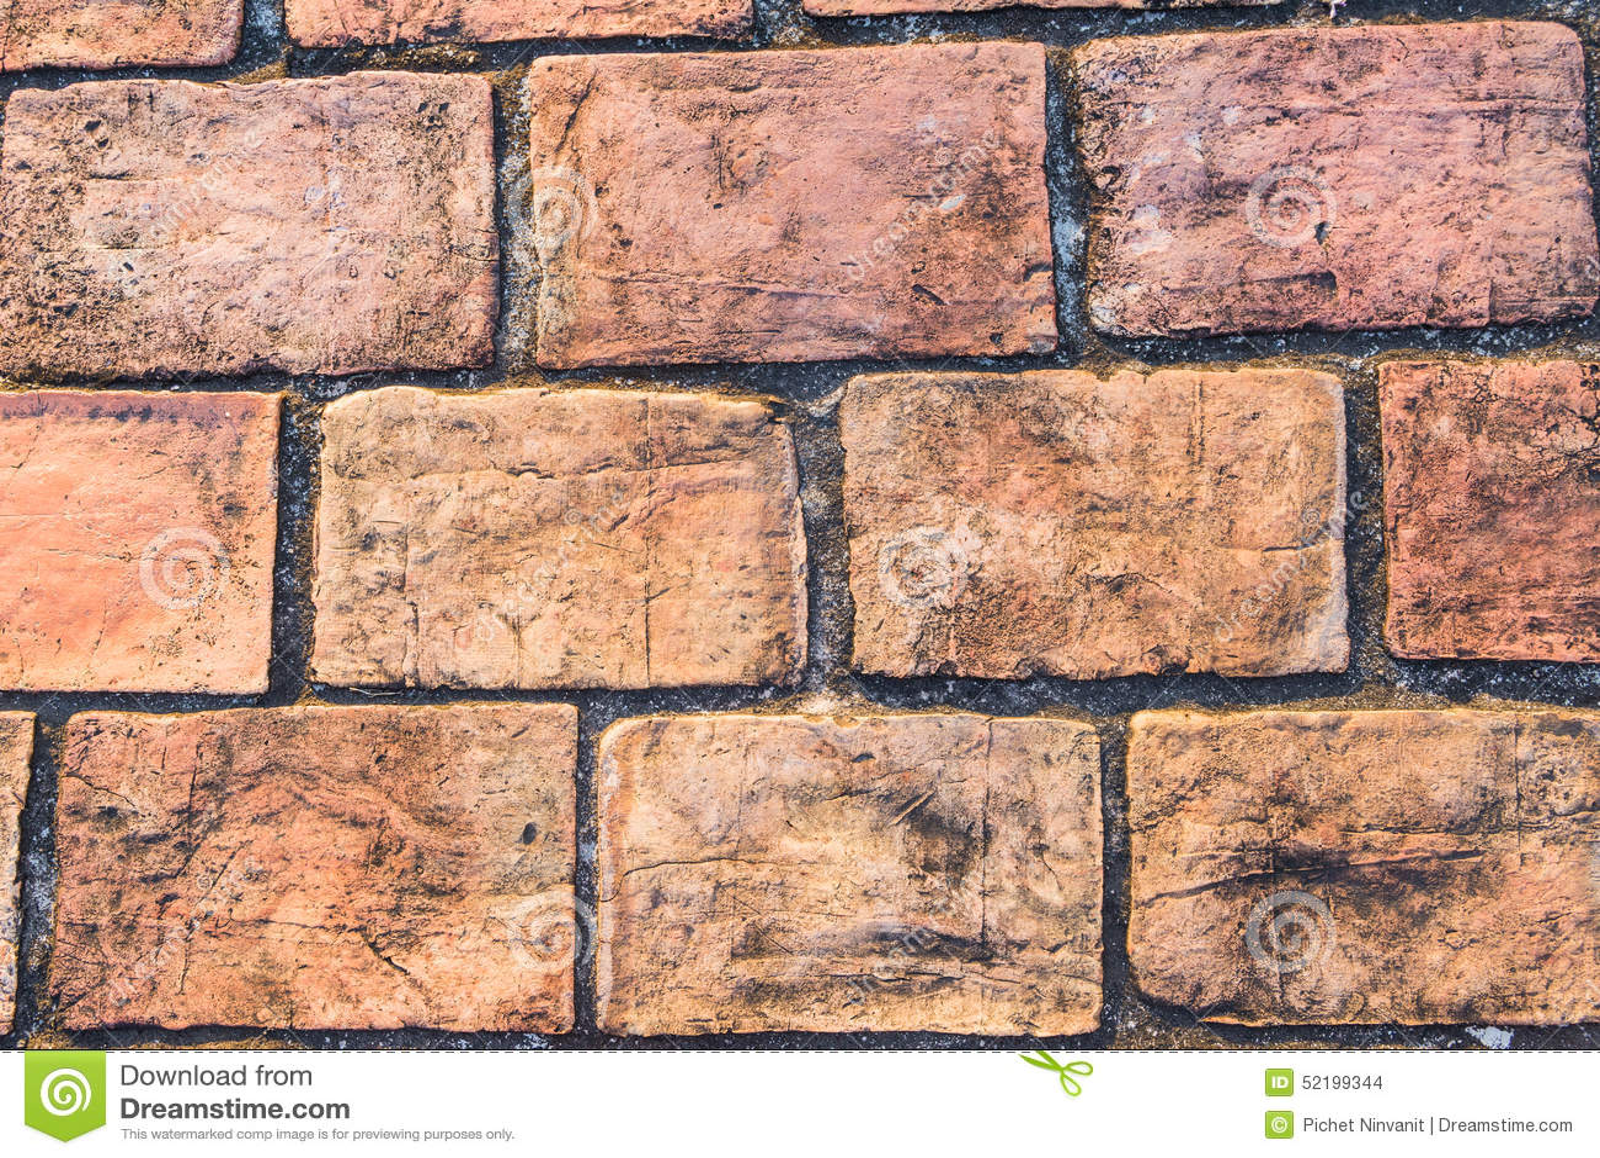 Marble Small Block : Orange stone block pavement texture stock photo